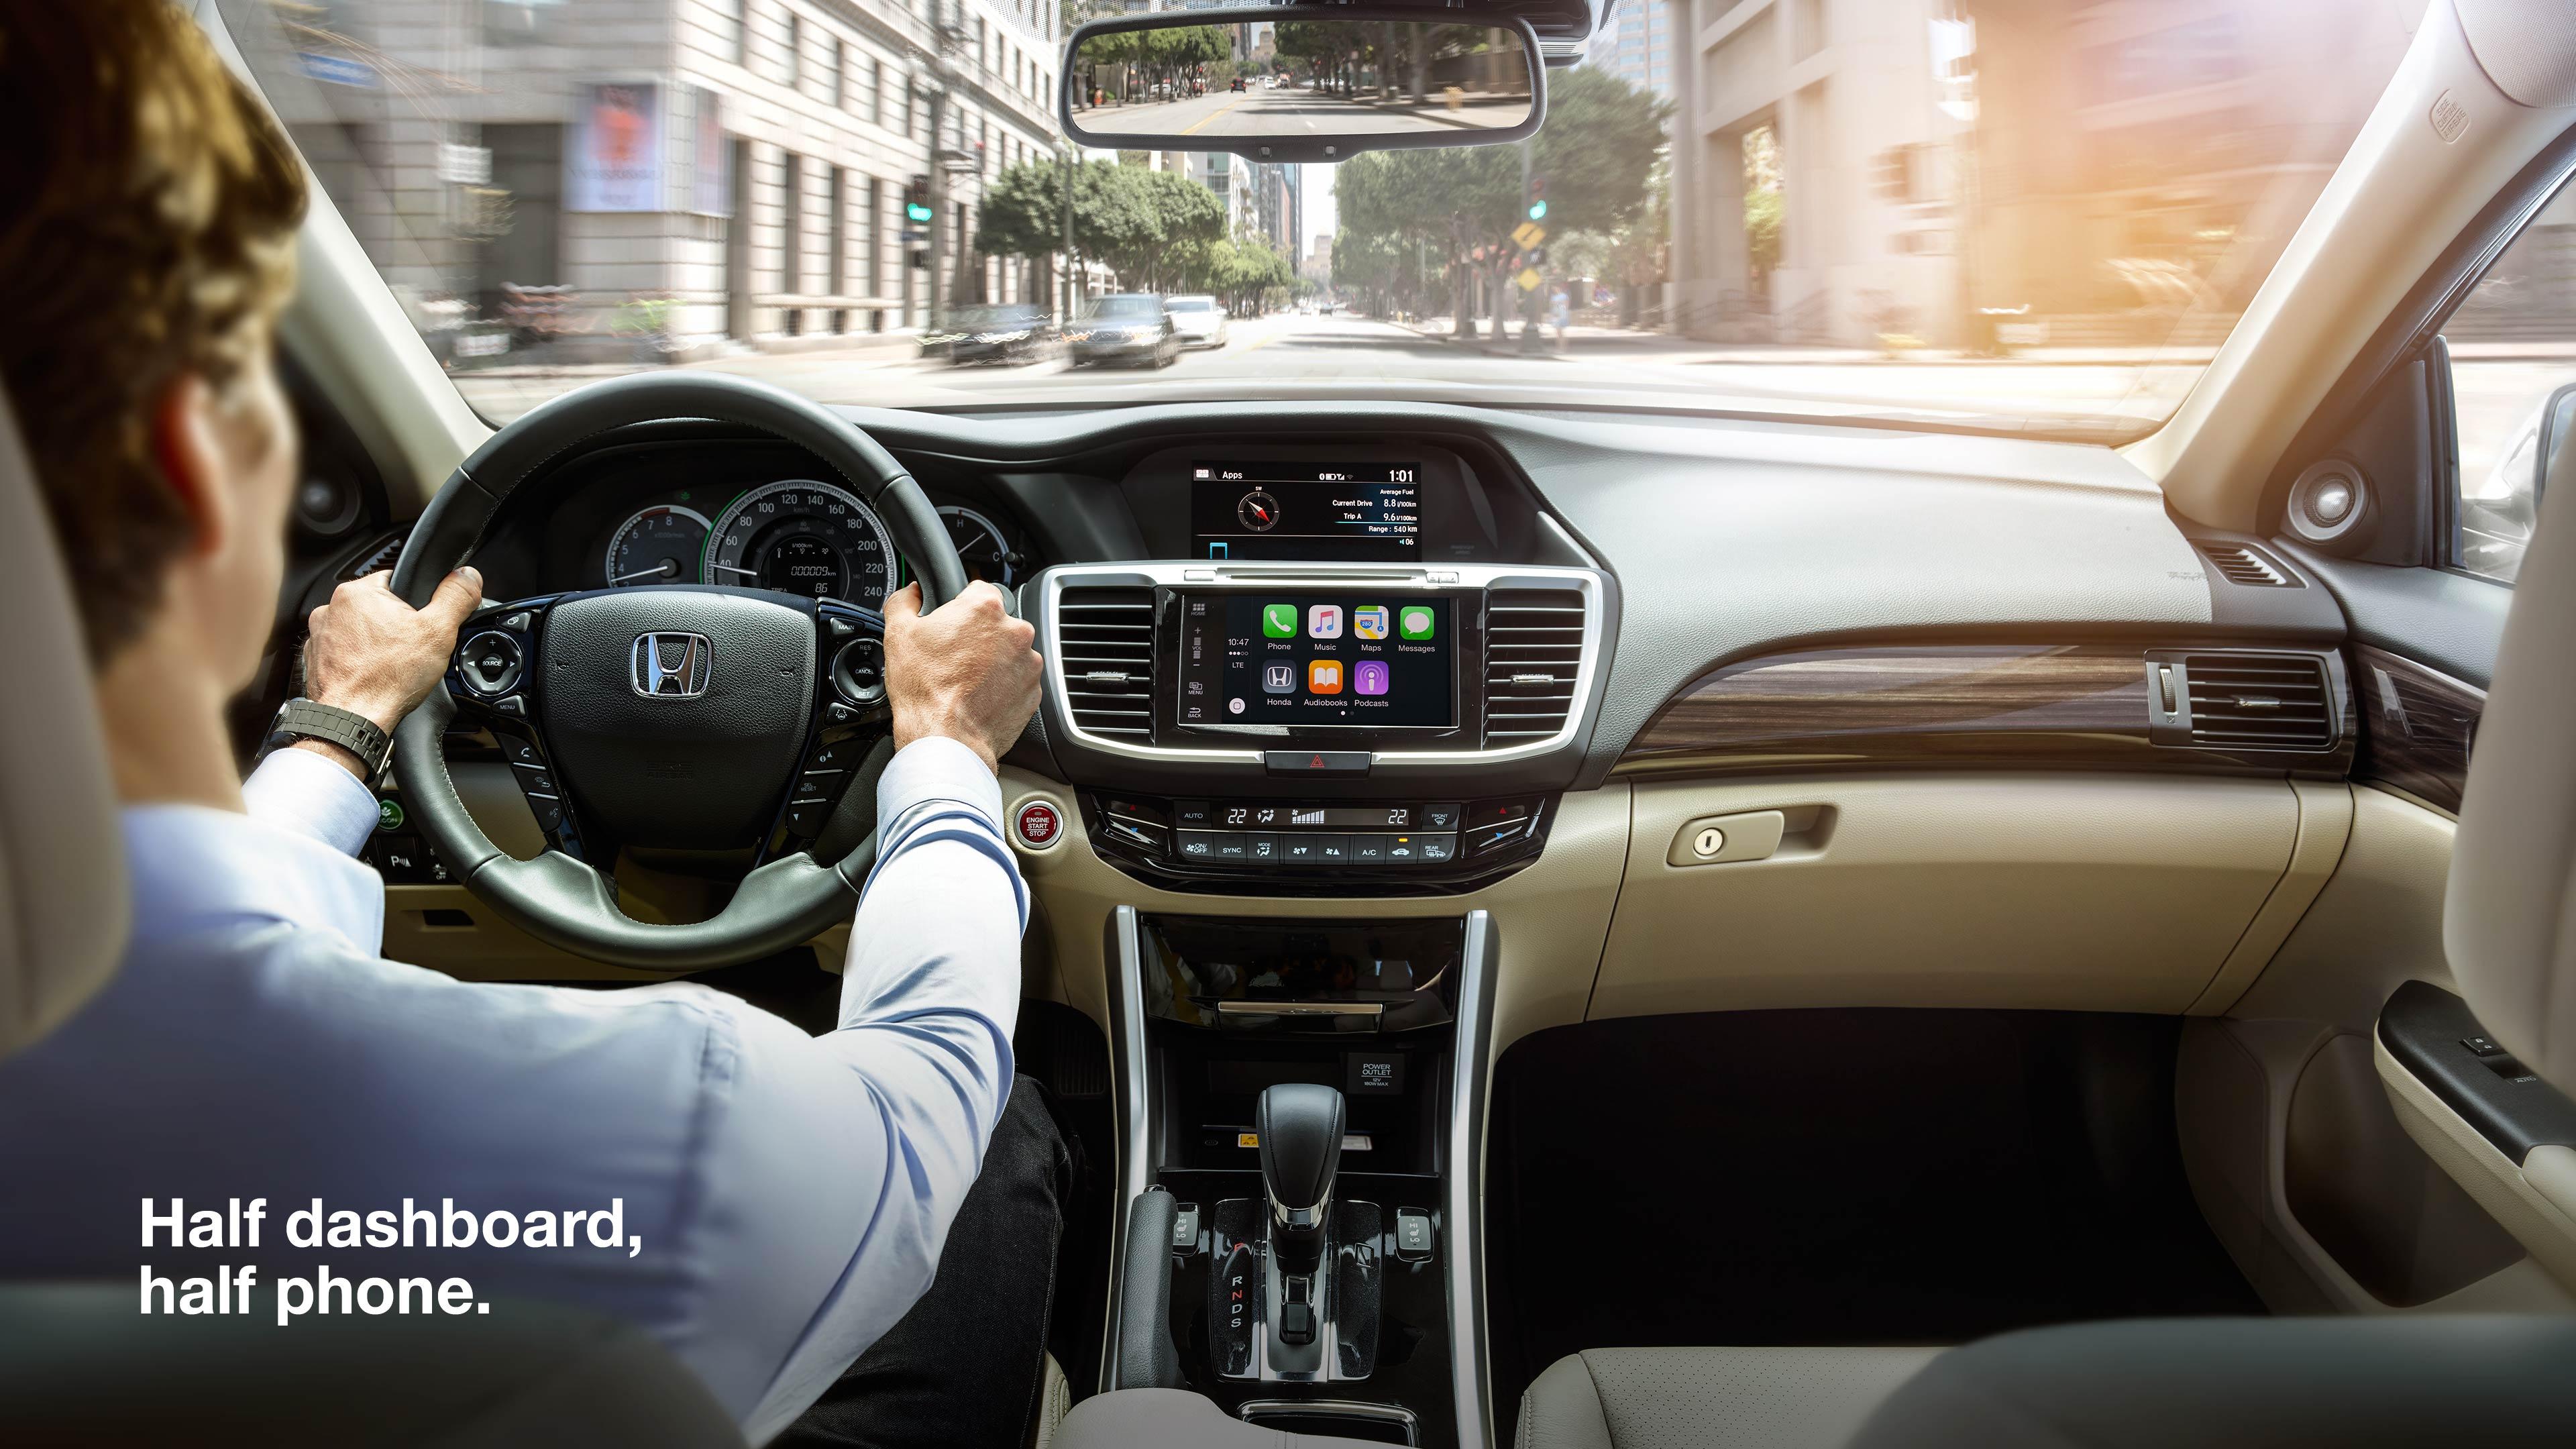 The All-New 2016 Accord Sedan Honda Canada